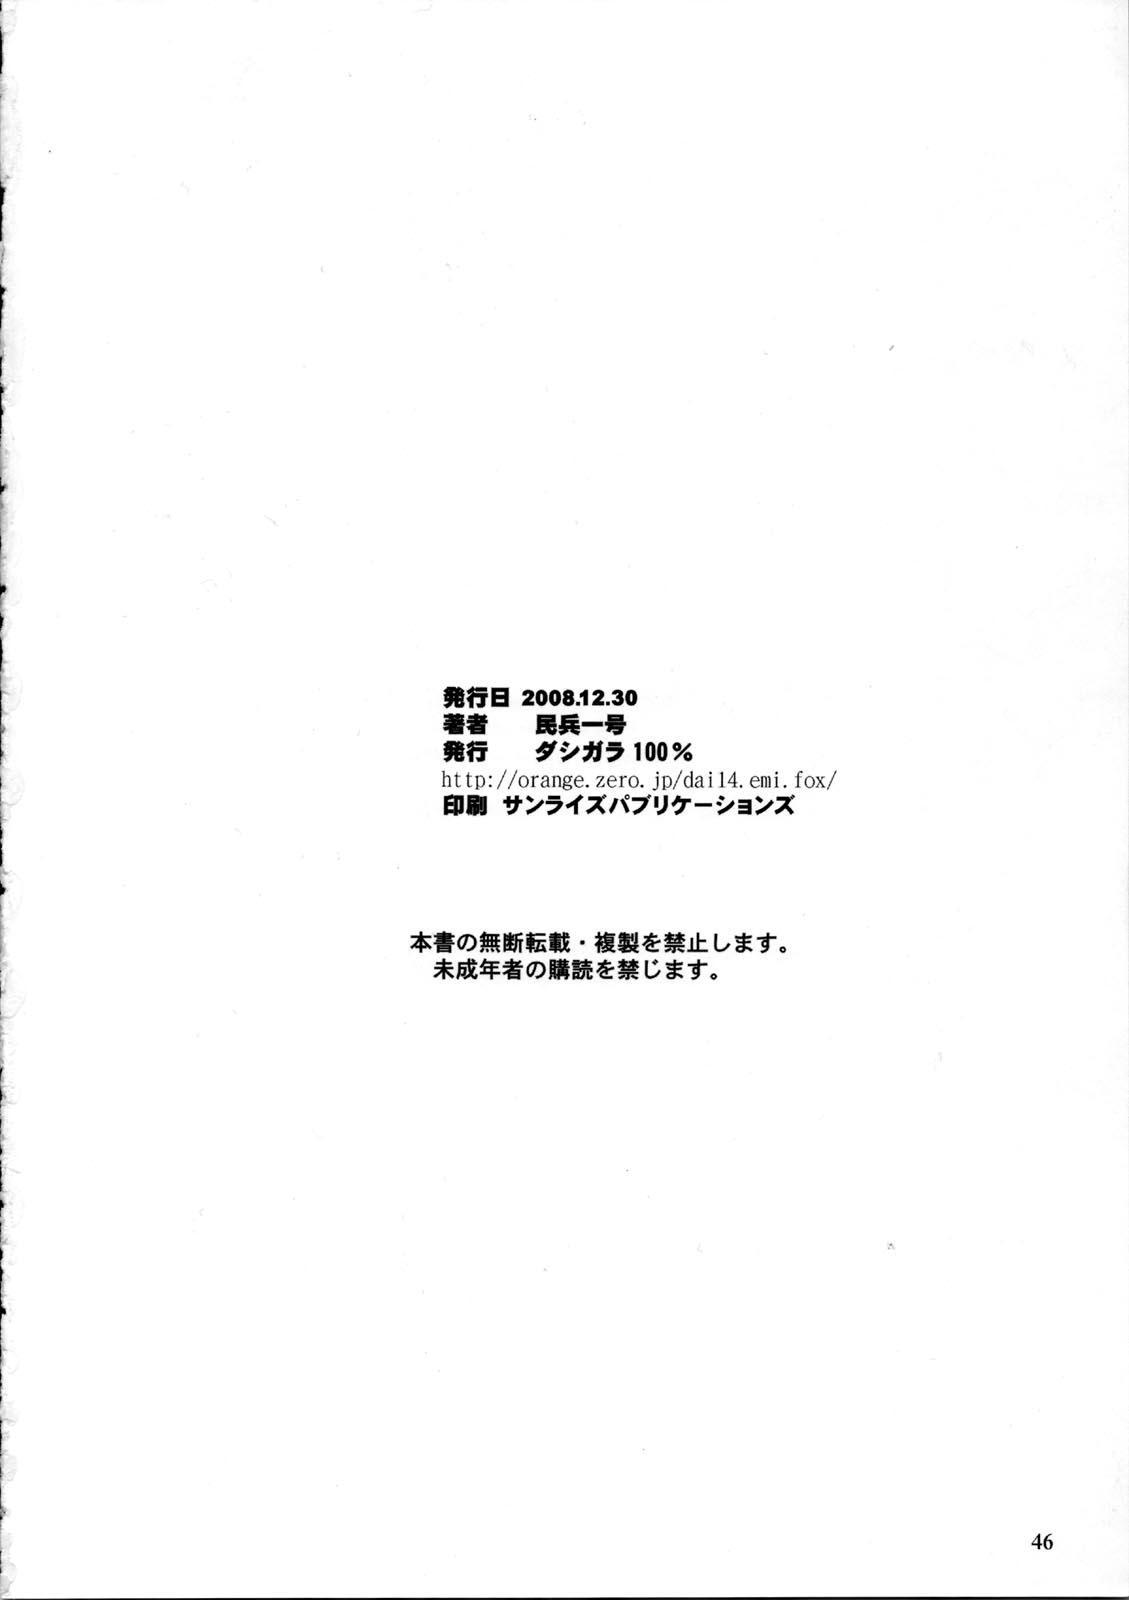 Copy-shi Soushuuhen 45